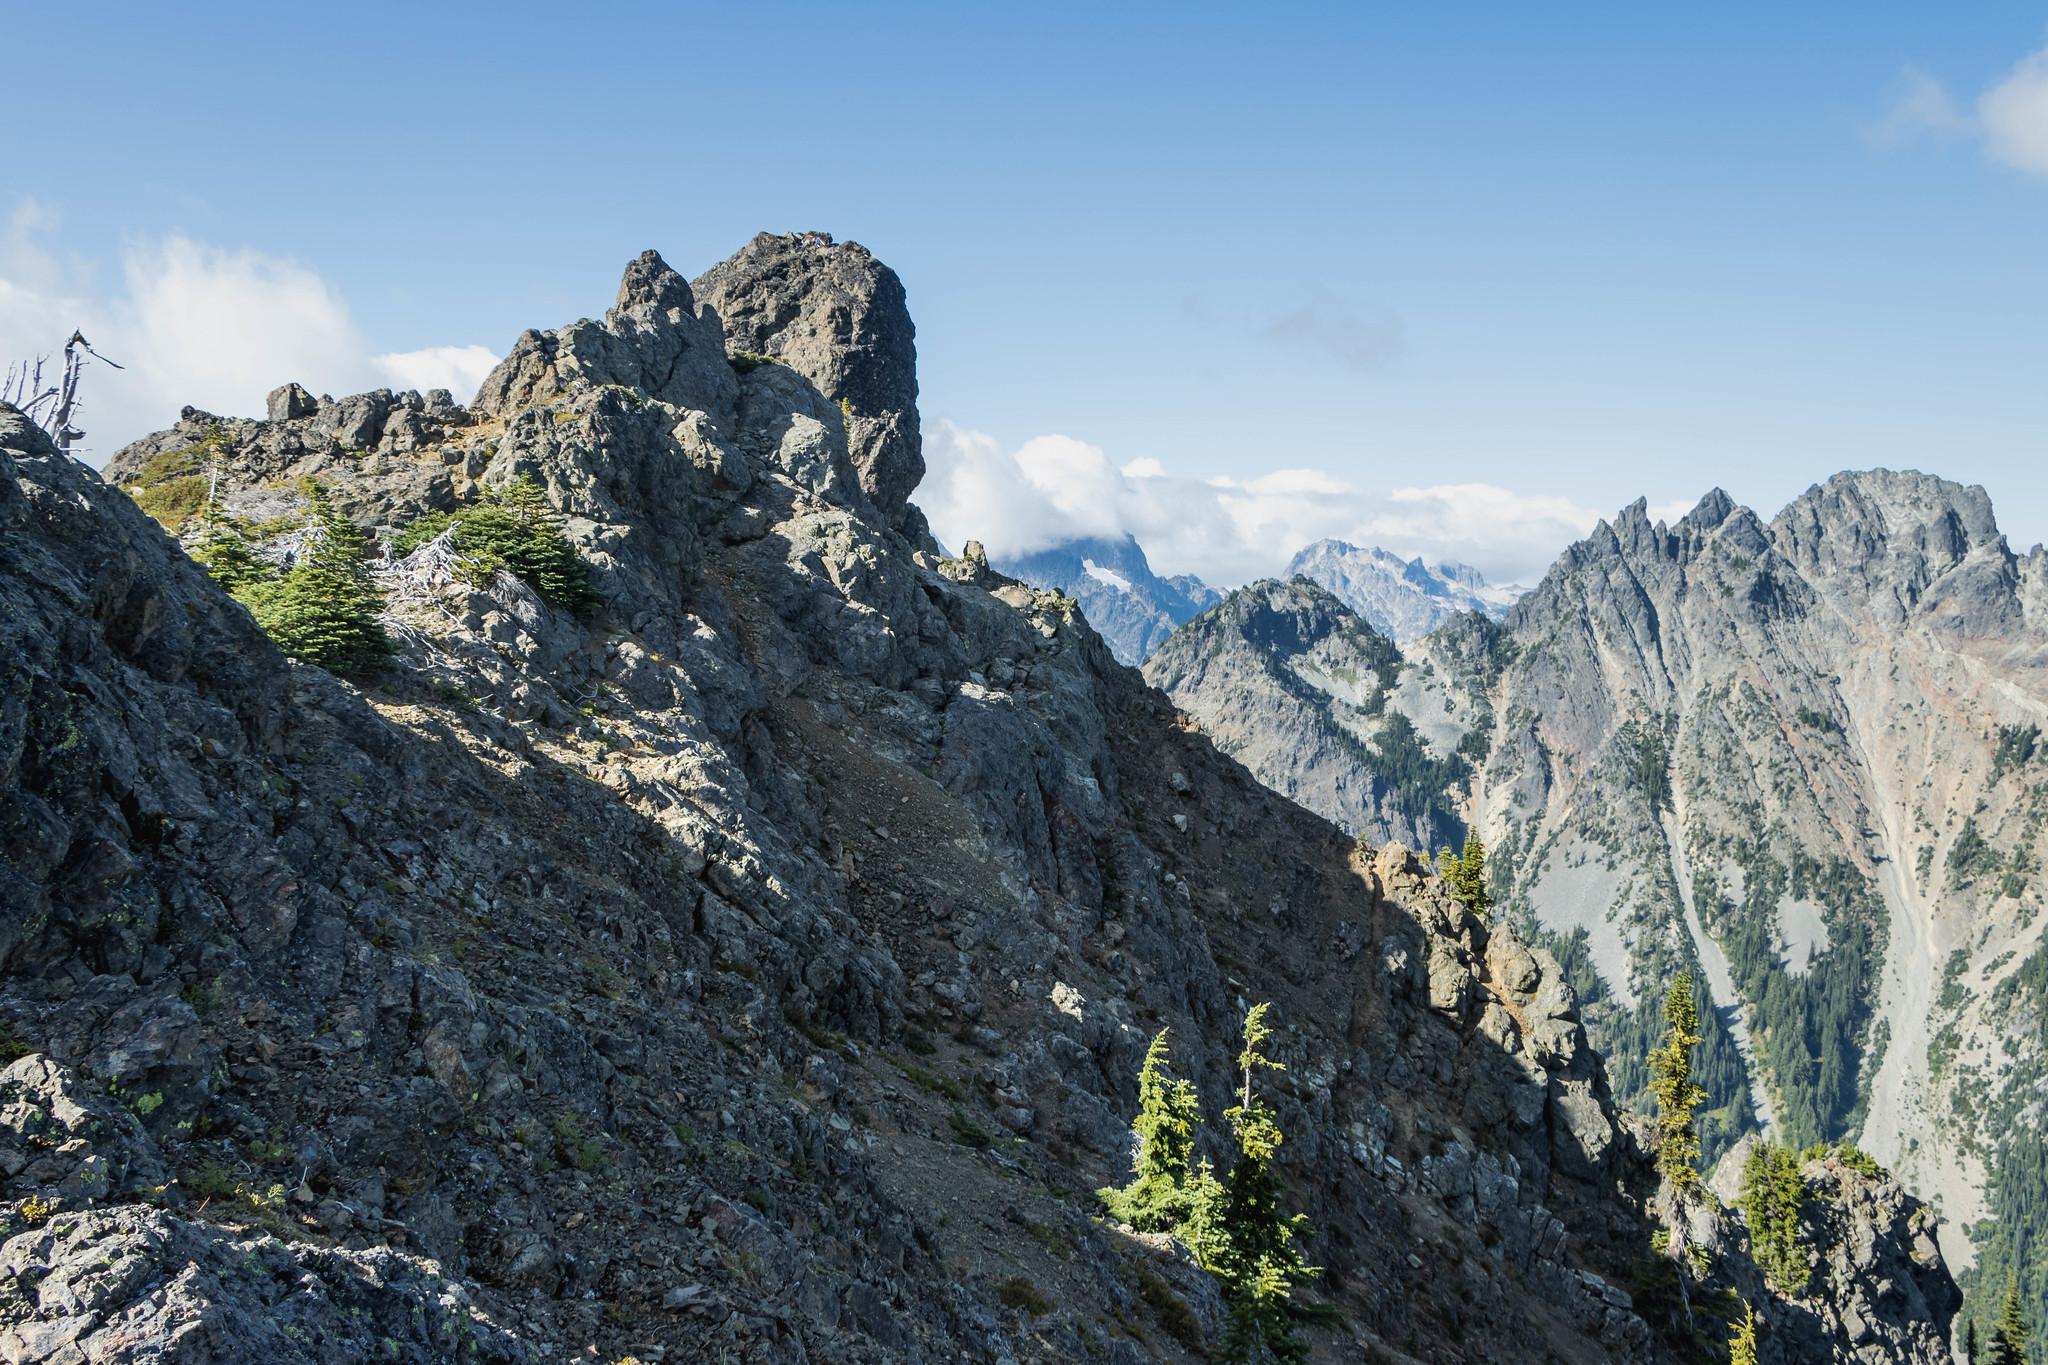 The final bit on Lobox Mountain